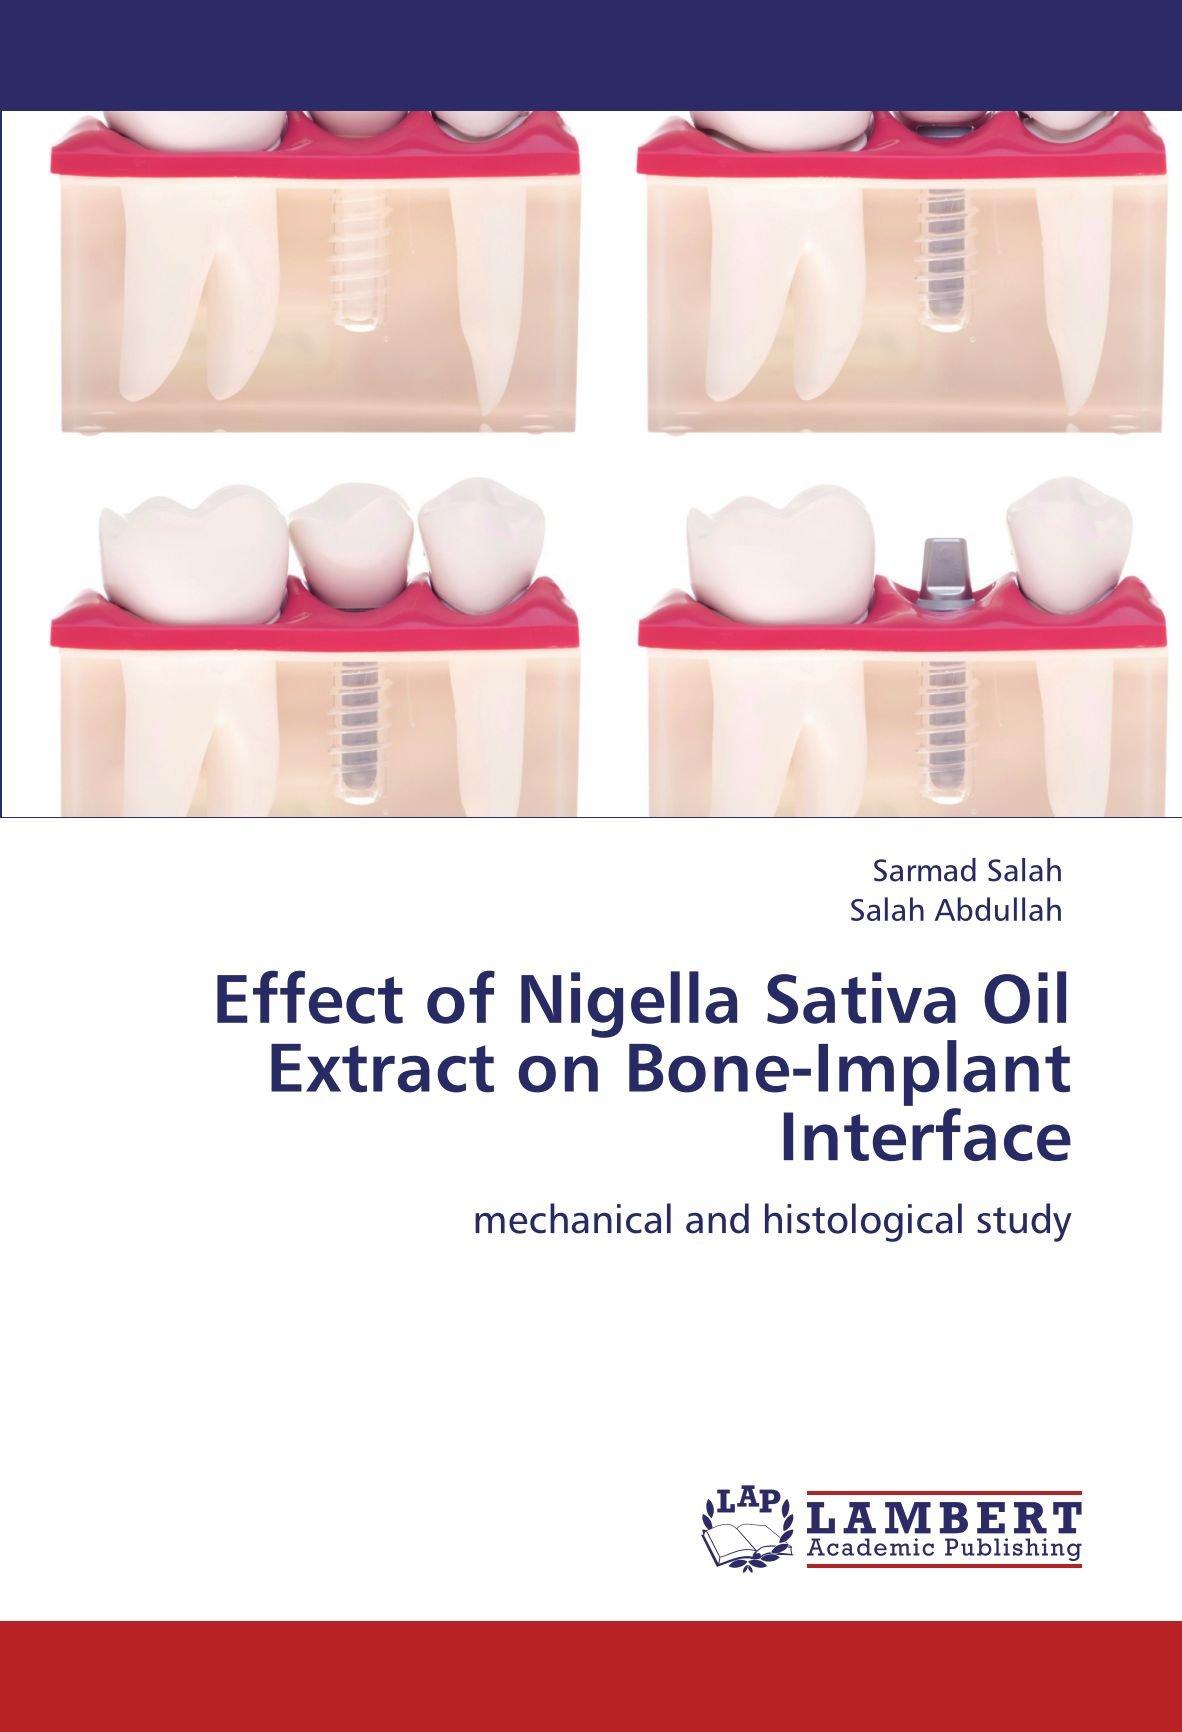 Effect of Nigella Sativa Oil Extract on Bone-Implant Interface